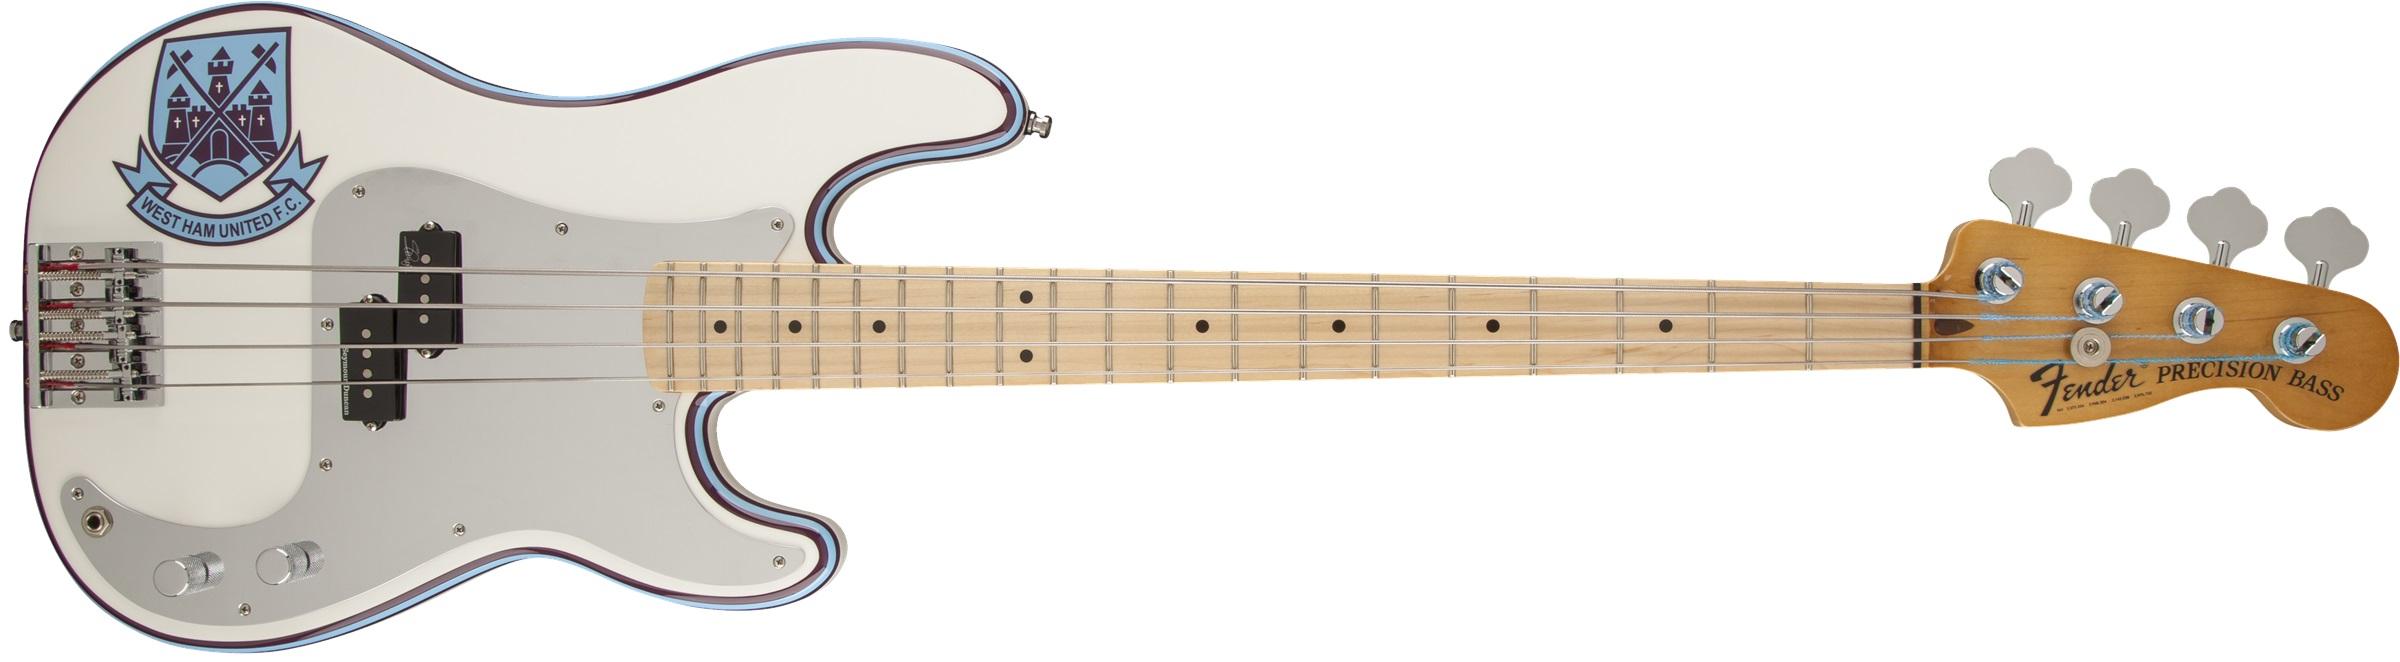 Fender Steve Harris Precision Bass MN RBM